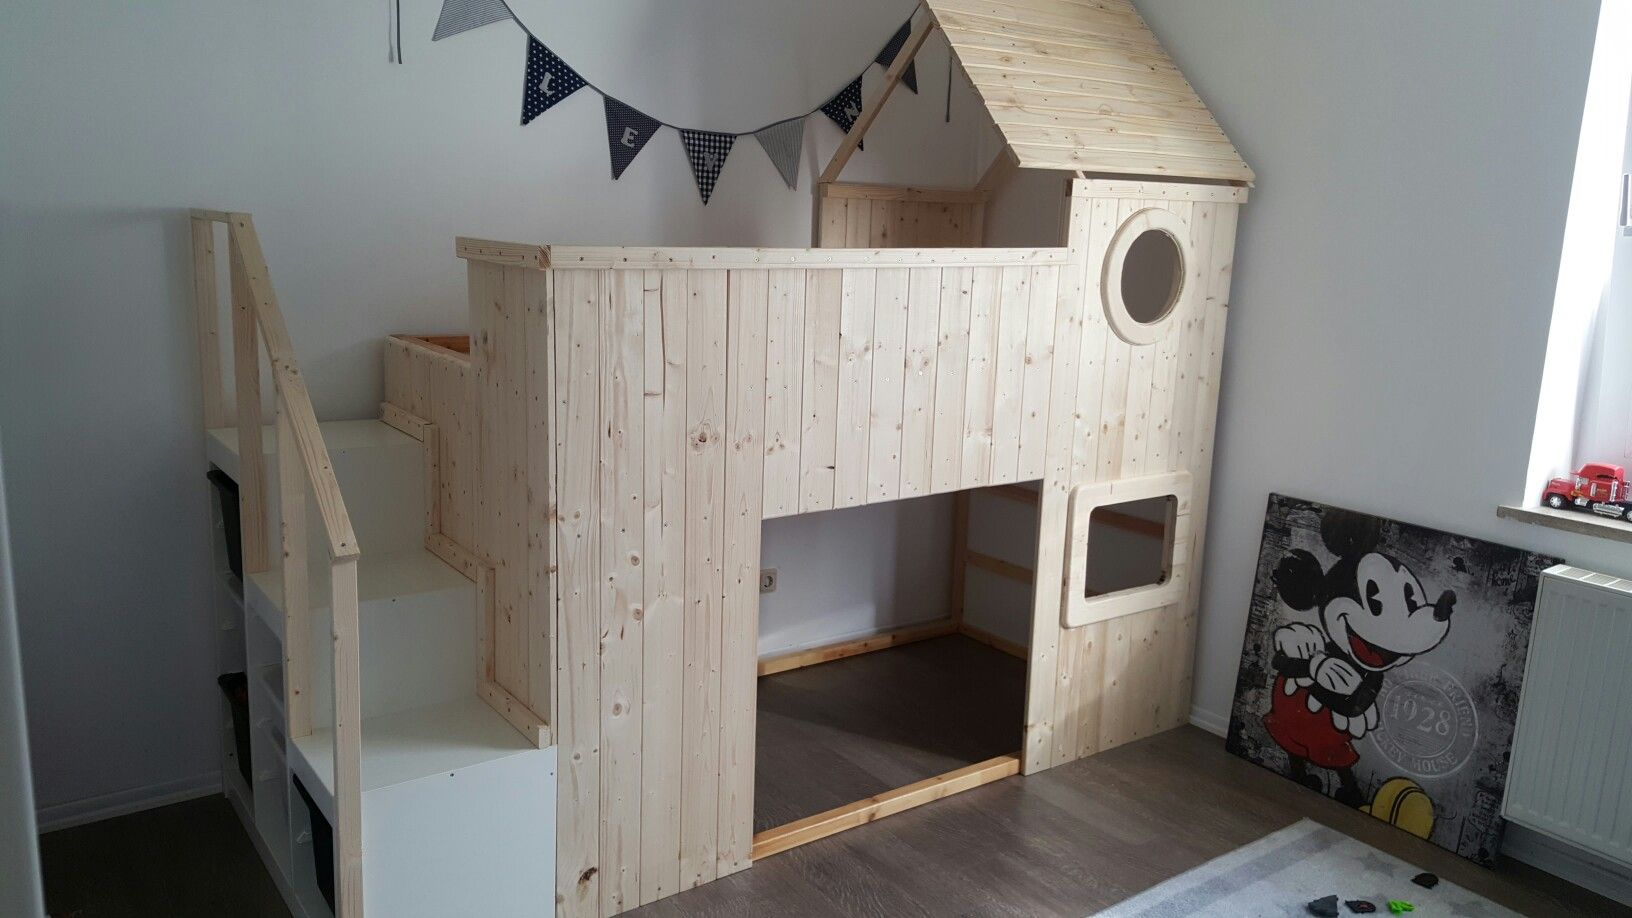 Ikea Kura Hack Diy Diy Design Ikea Kura Kura Bed Und